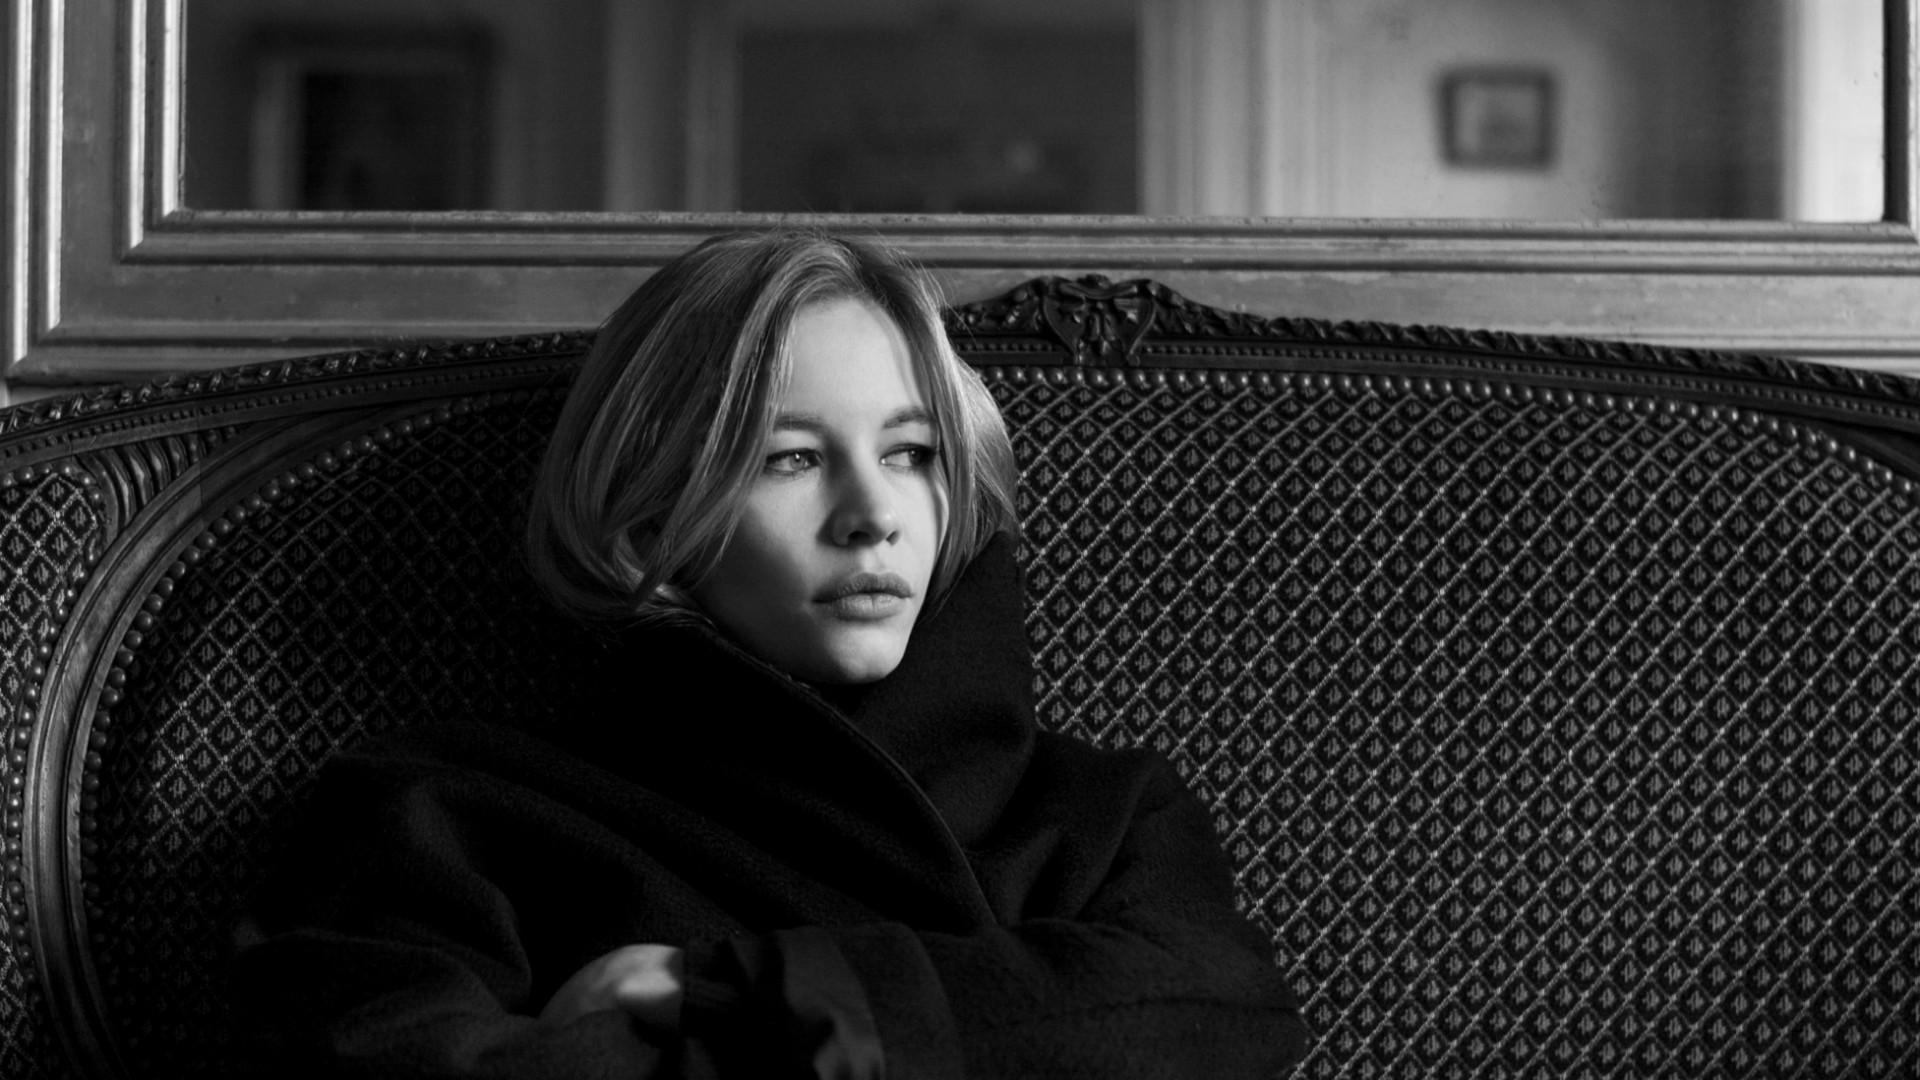 Alisa Khazanova hype production film «middleground» - hype production